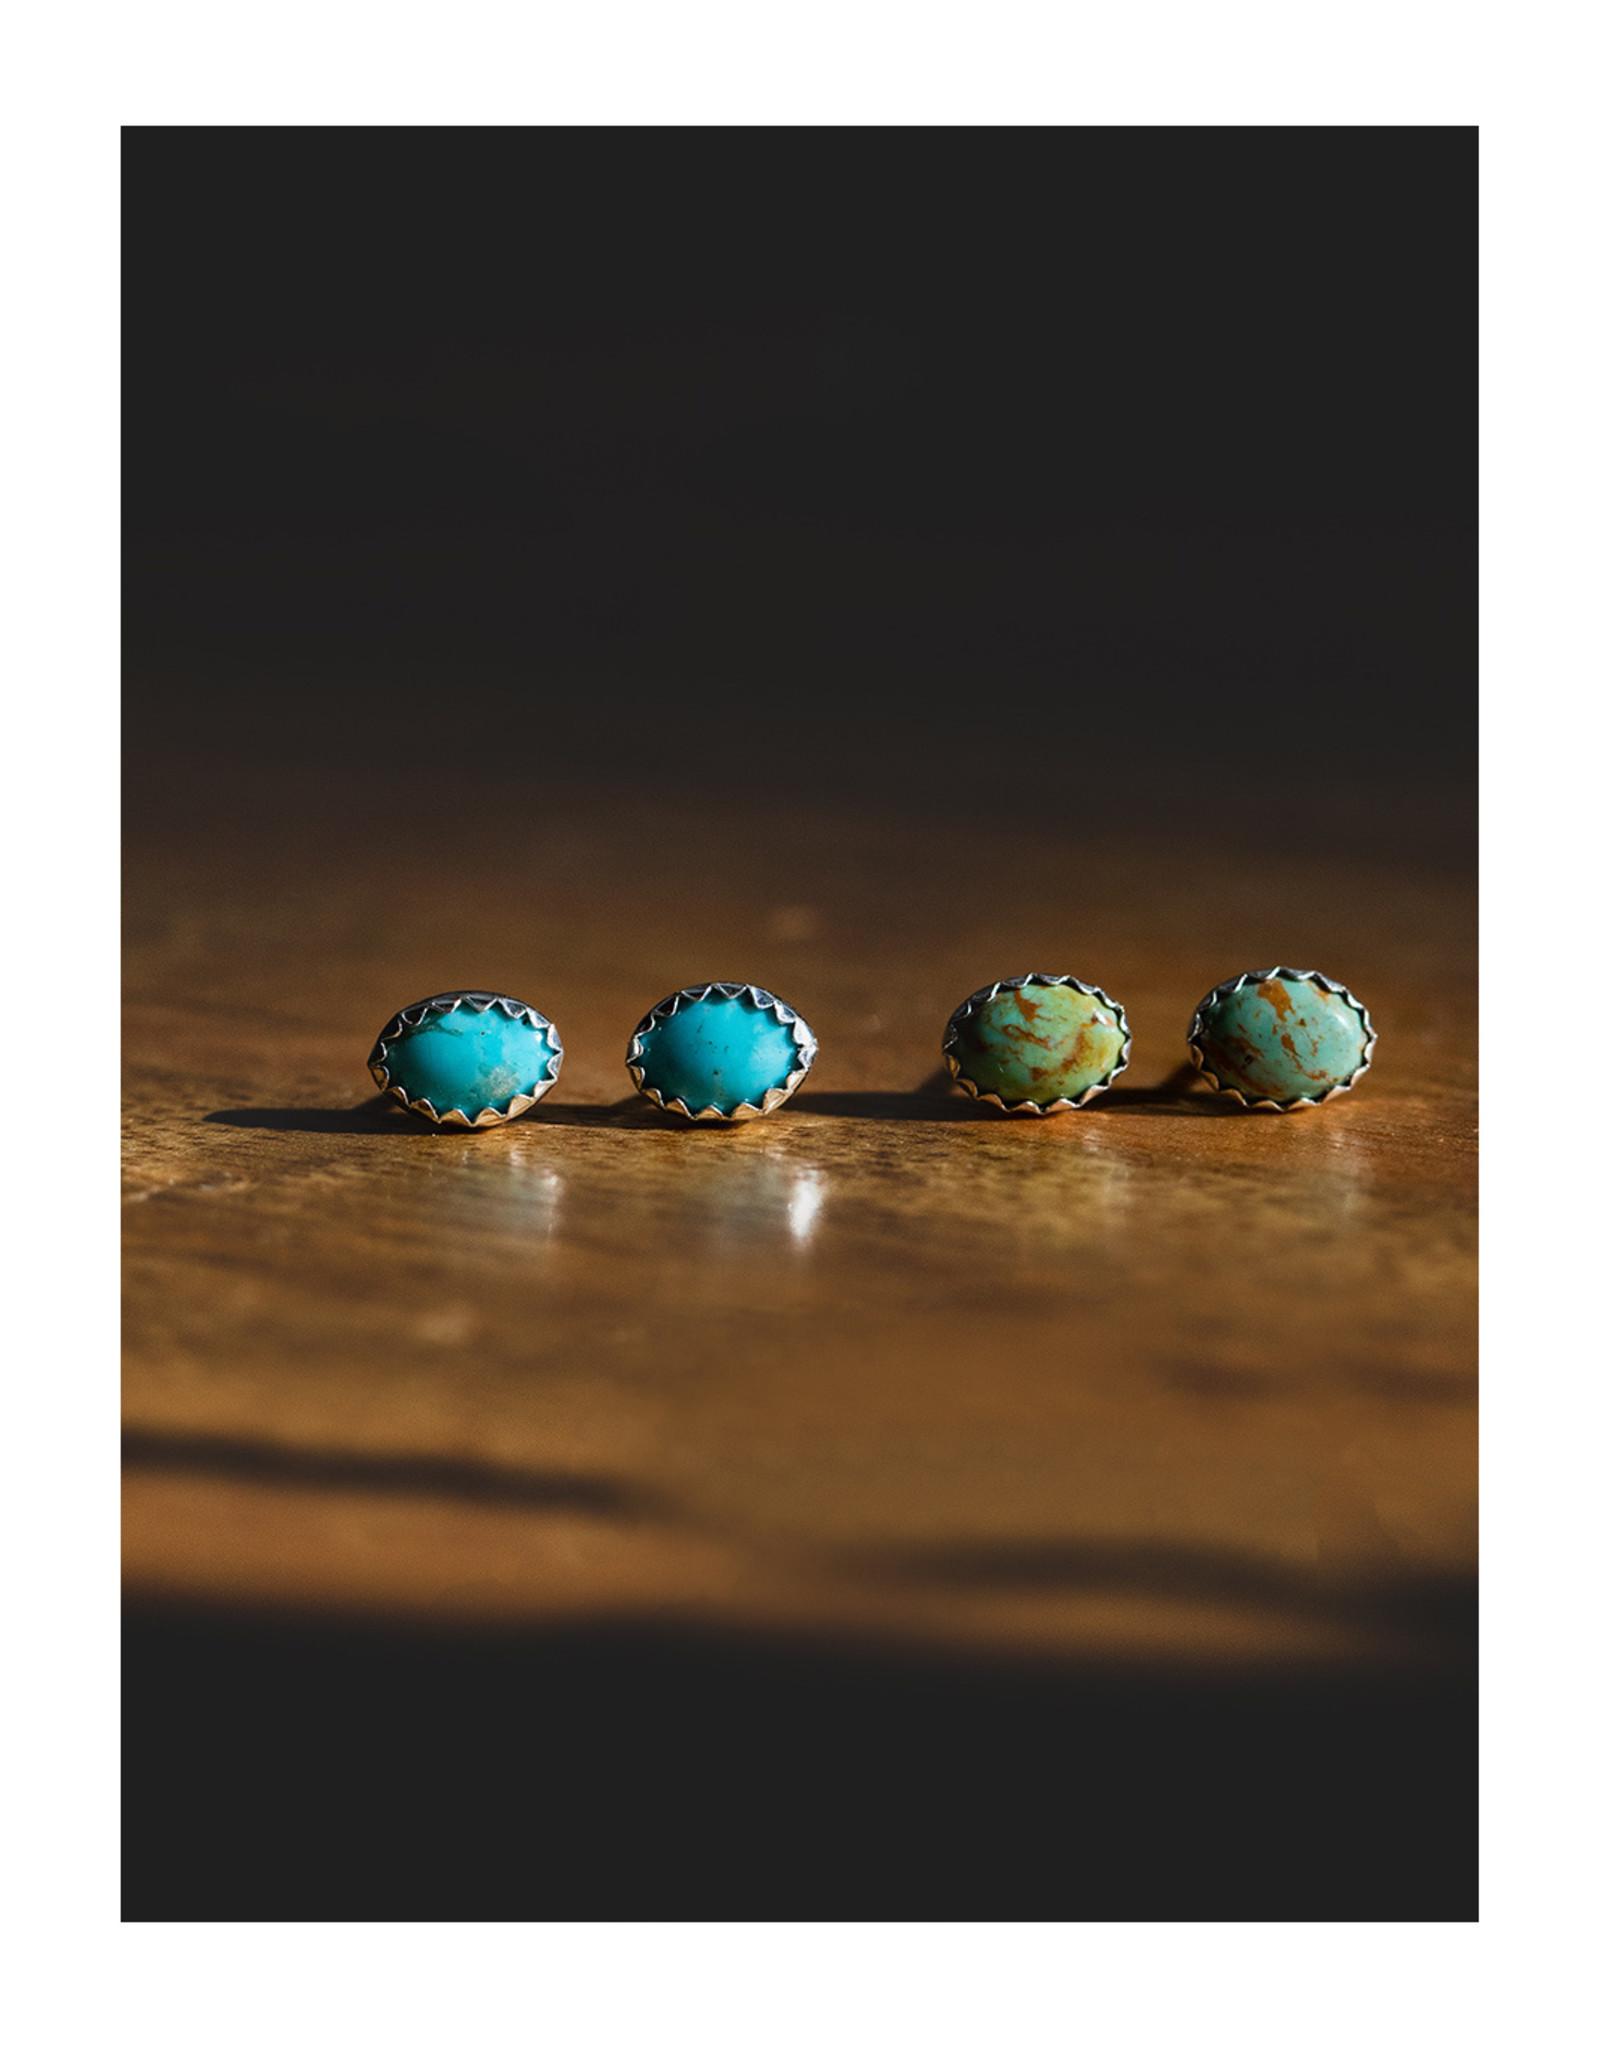 sara forrest design Kingman Mined Turquoise Studs by Sara Forrest Design